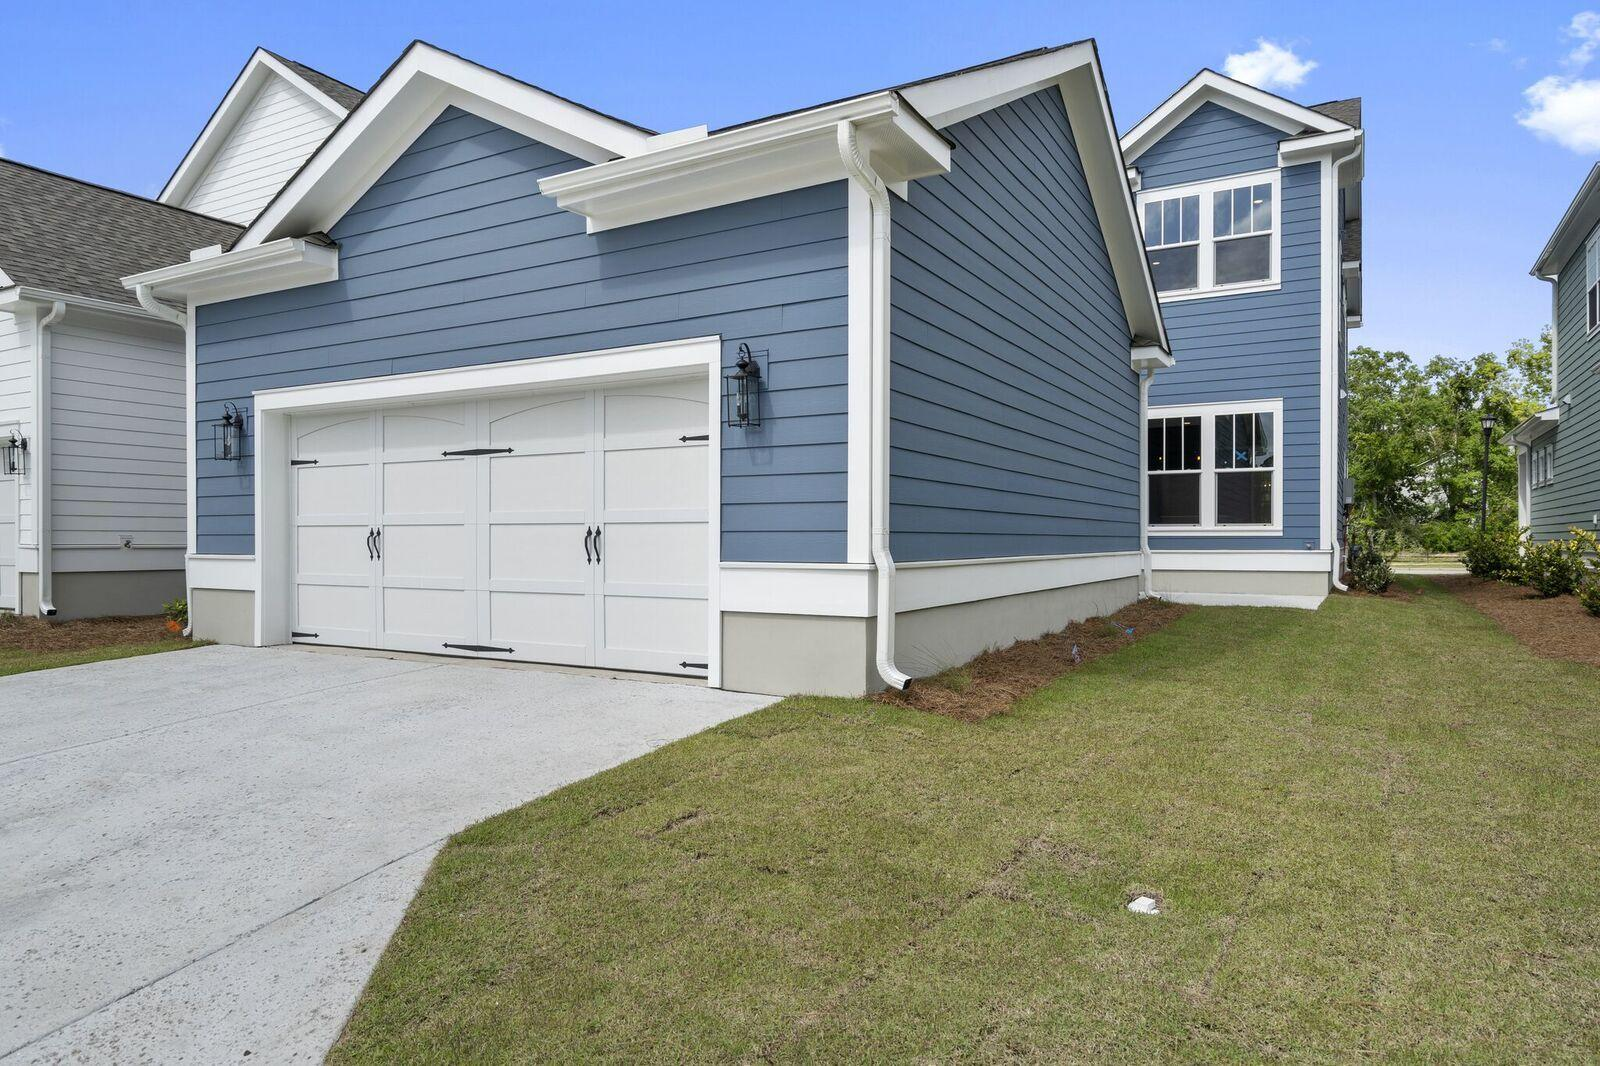 Midtown Homes For Sale - 1533 Kepley, Mount Pleasant, SC - 44